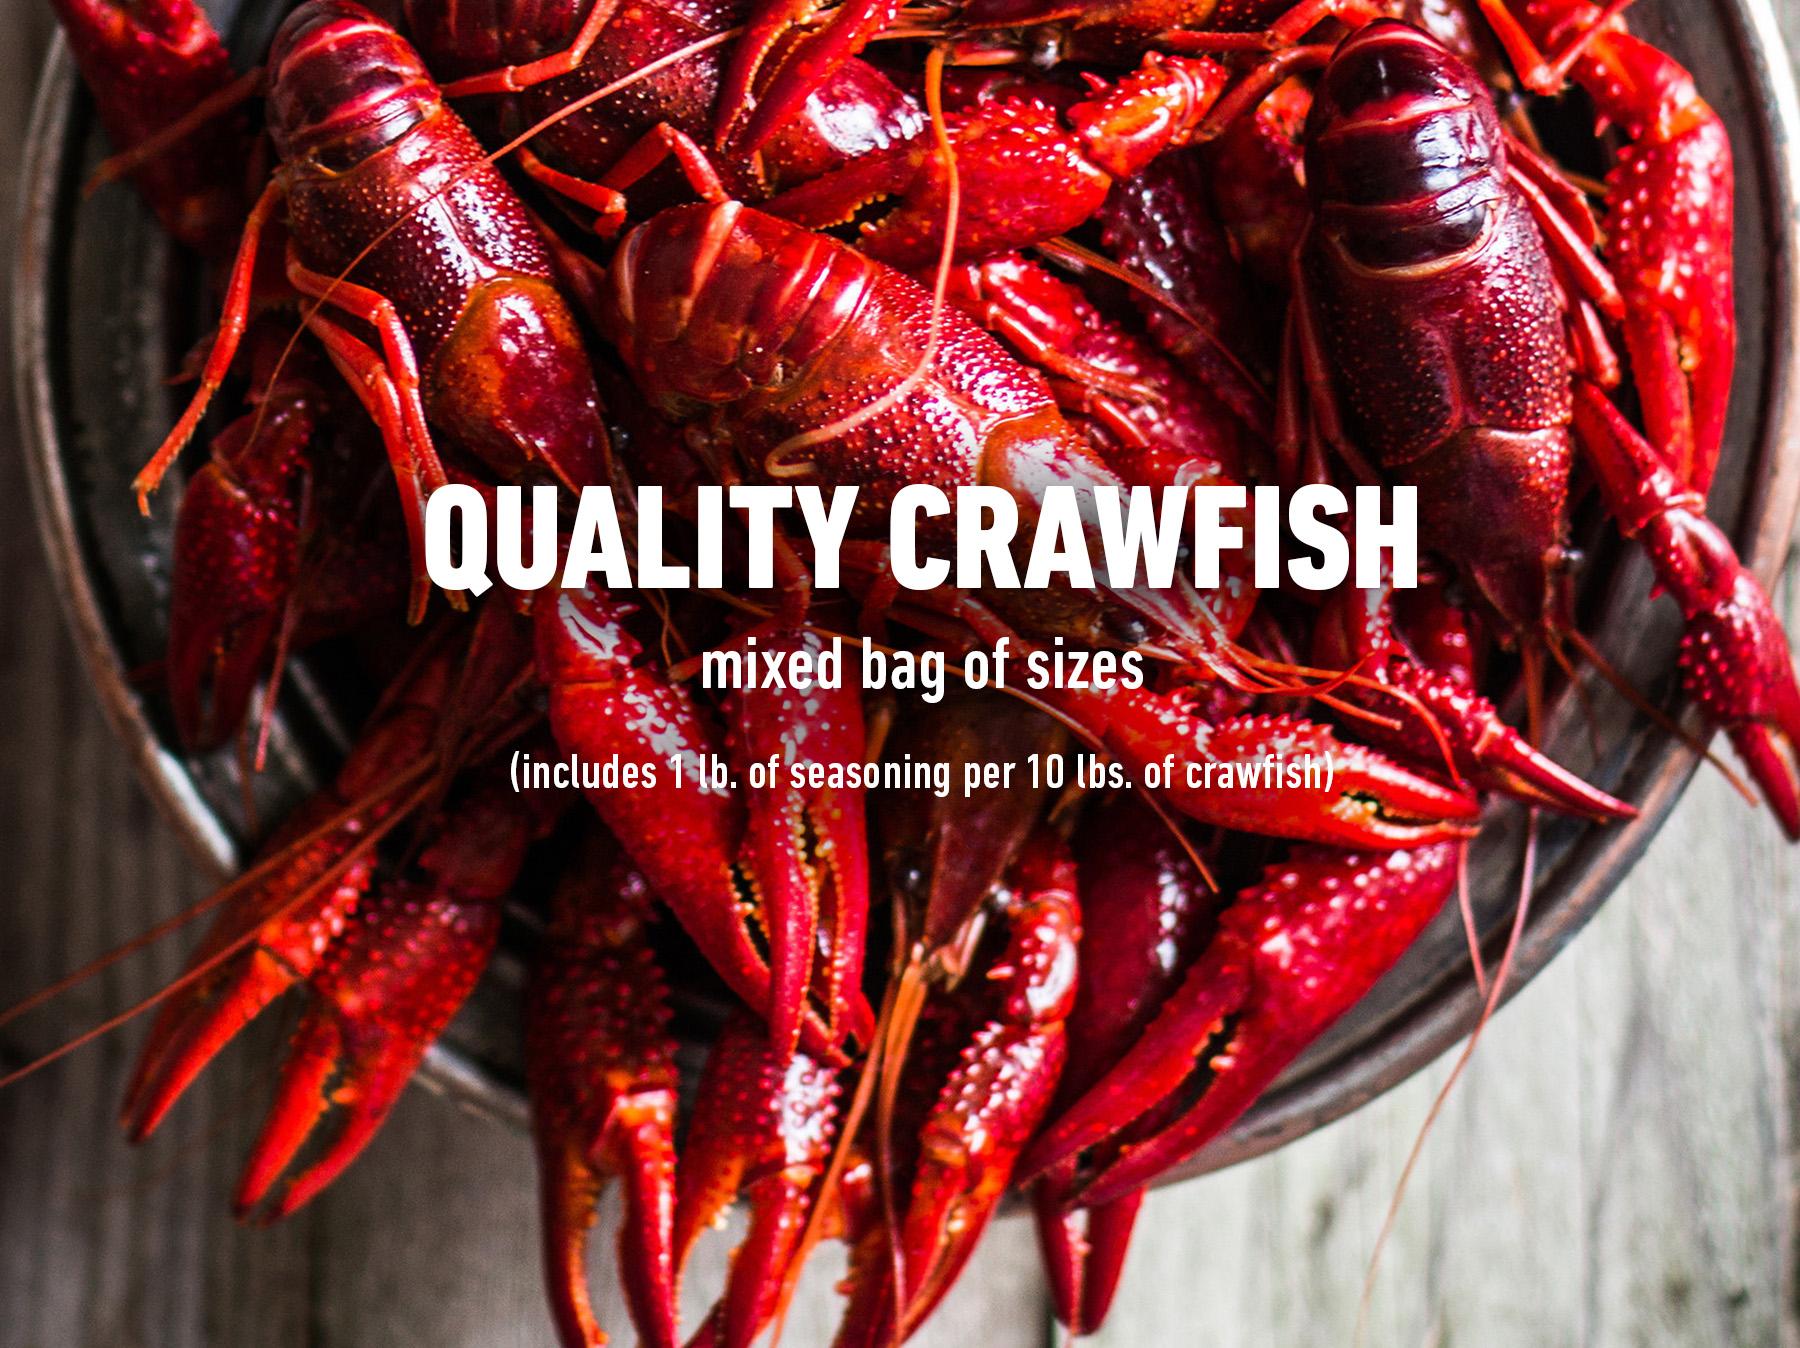 Quality crawfish